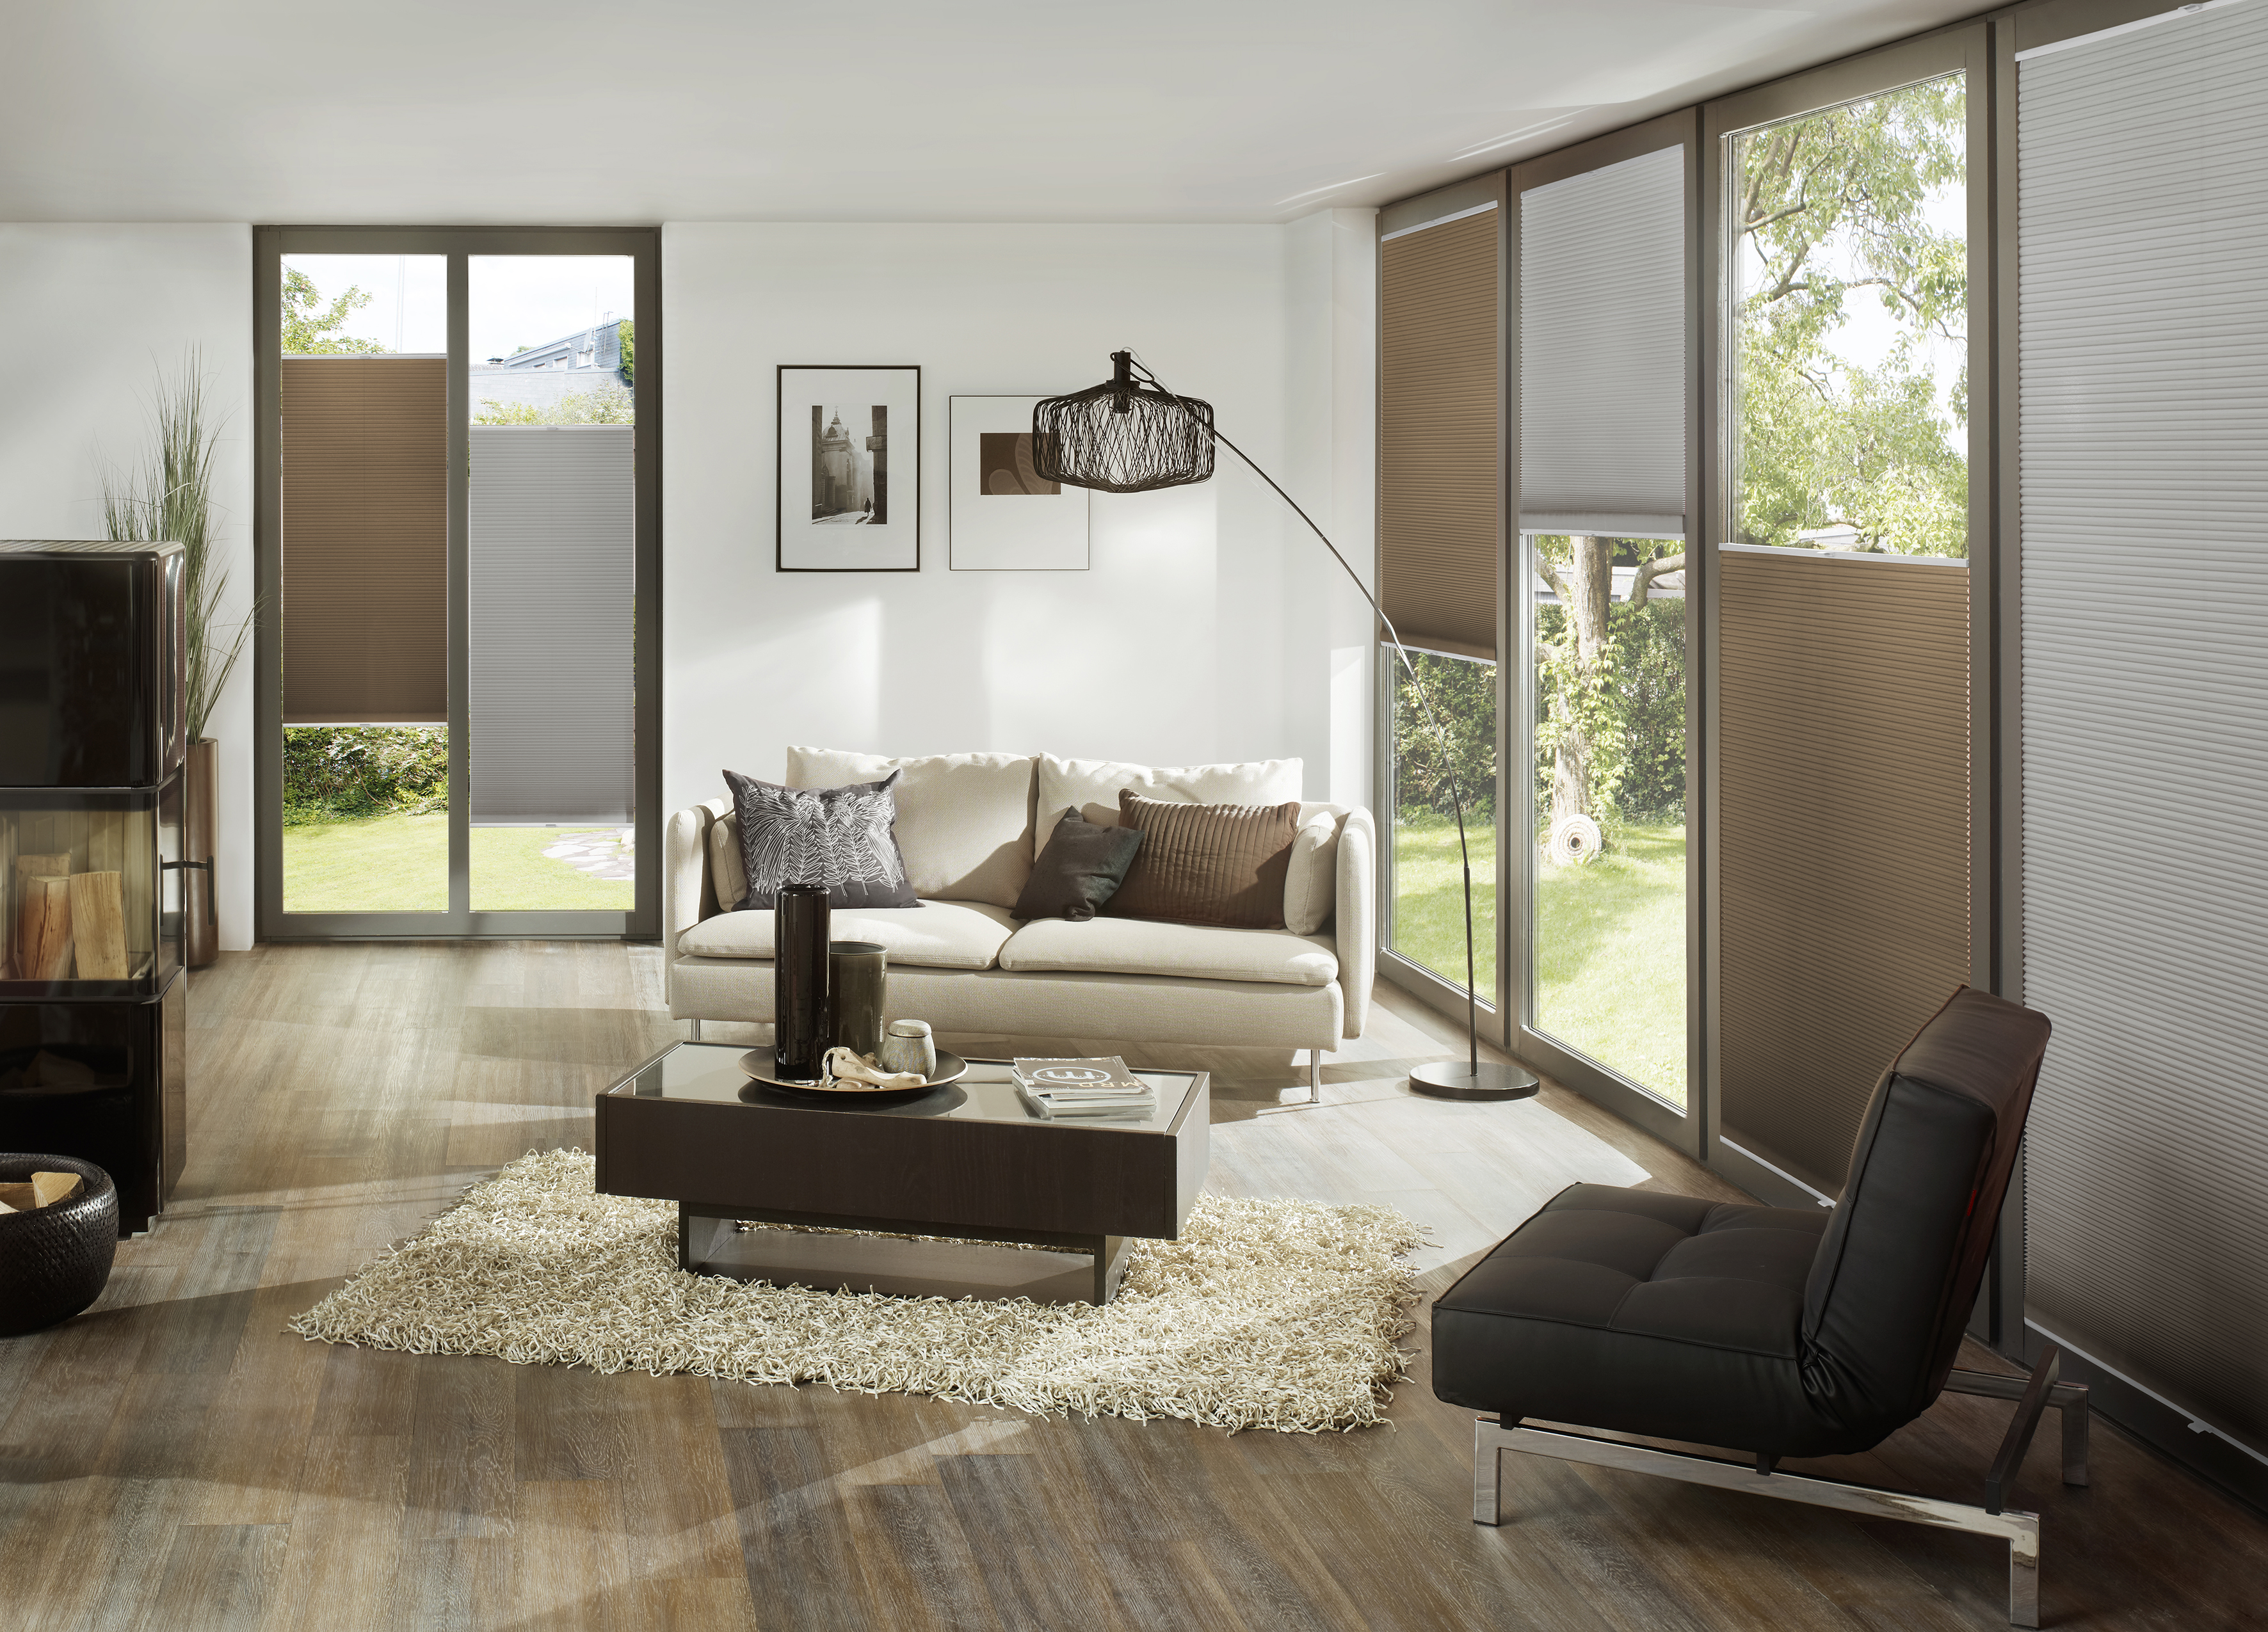 sonnenschutz sonnensegel h ring raumgestaltung leipzig. Black Bedroom Furniture Sets. Home Design Ideas